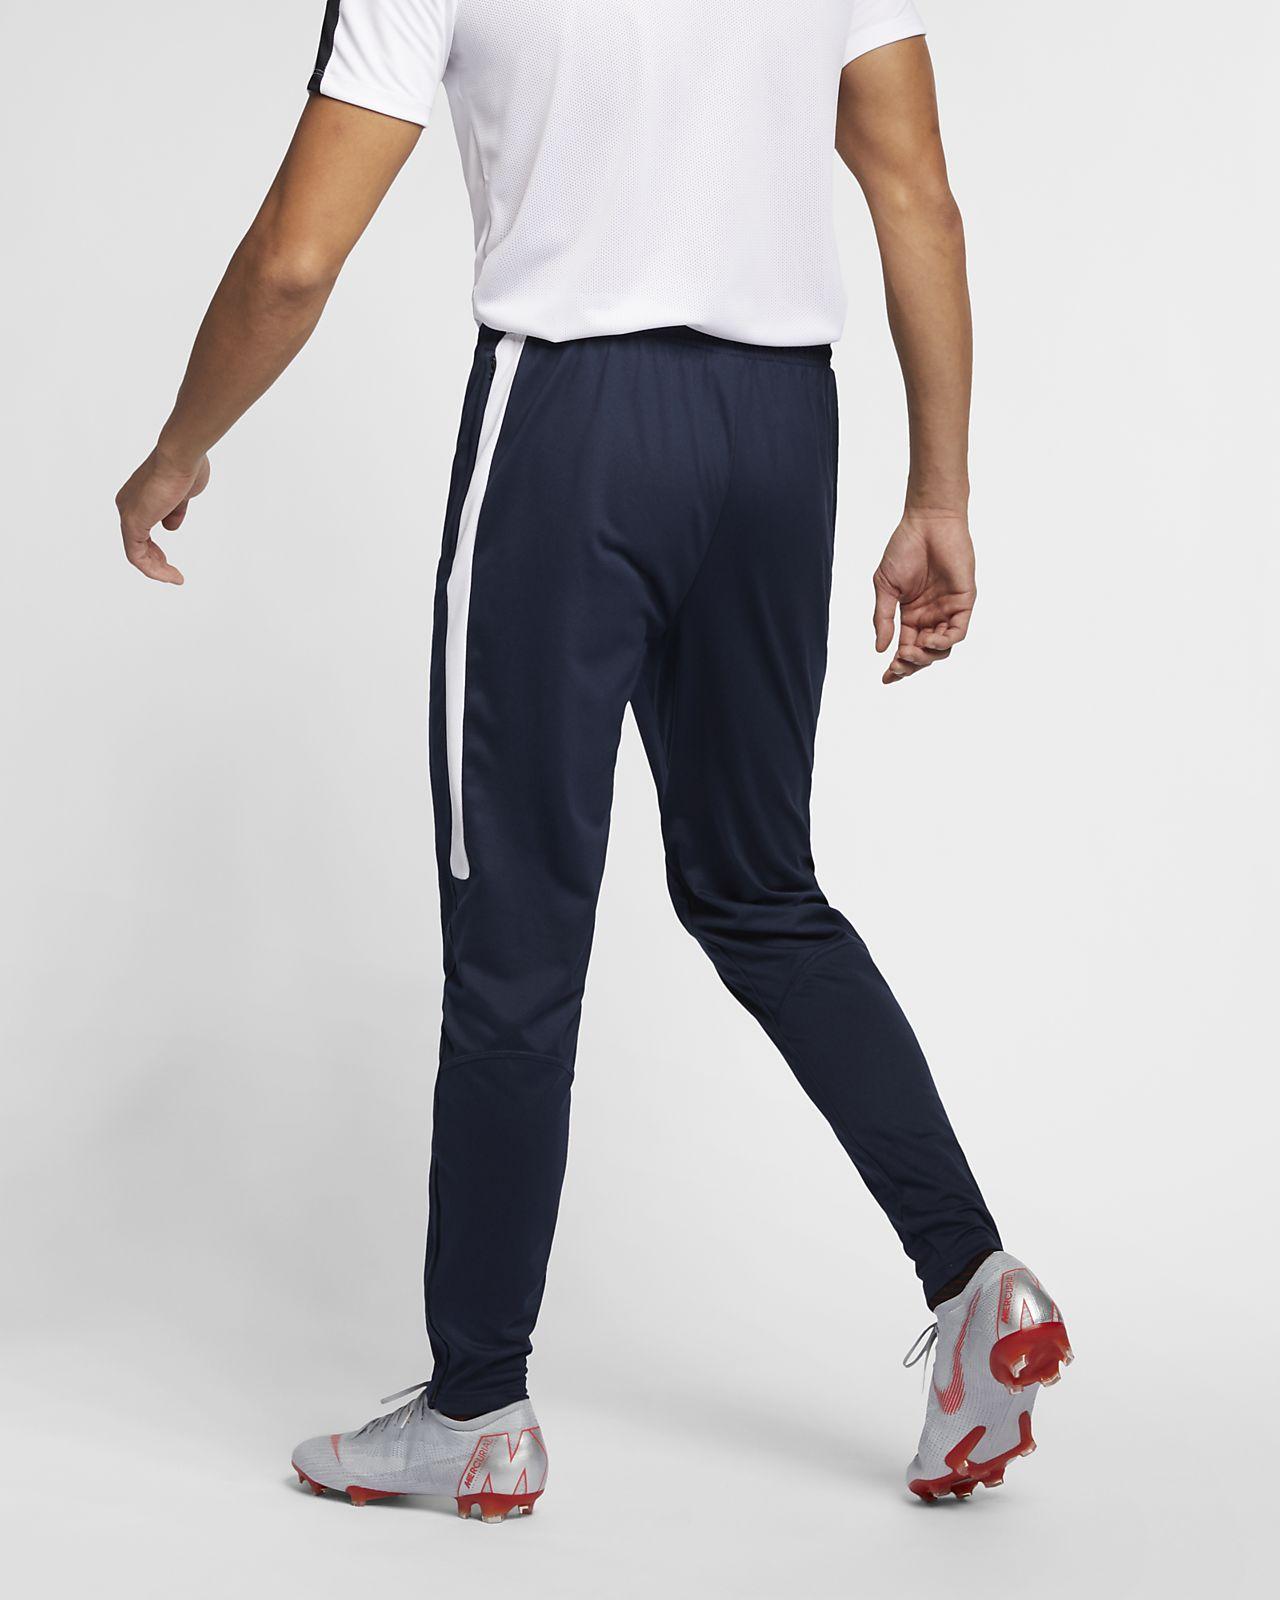 Nike Dri FIT Academy Men's Football Pants